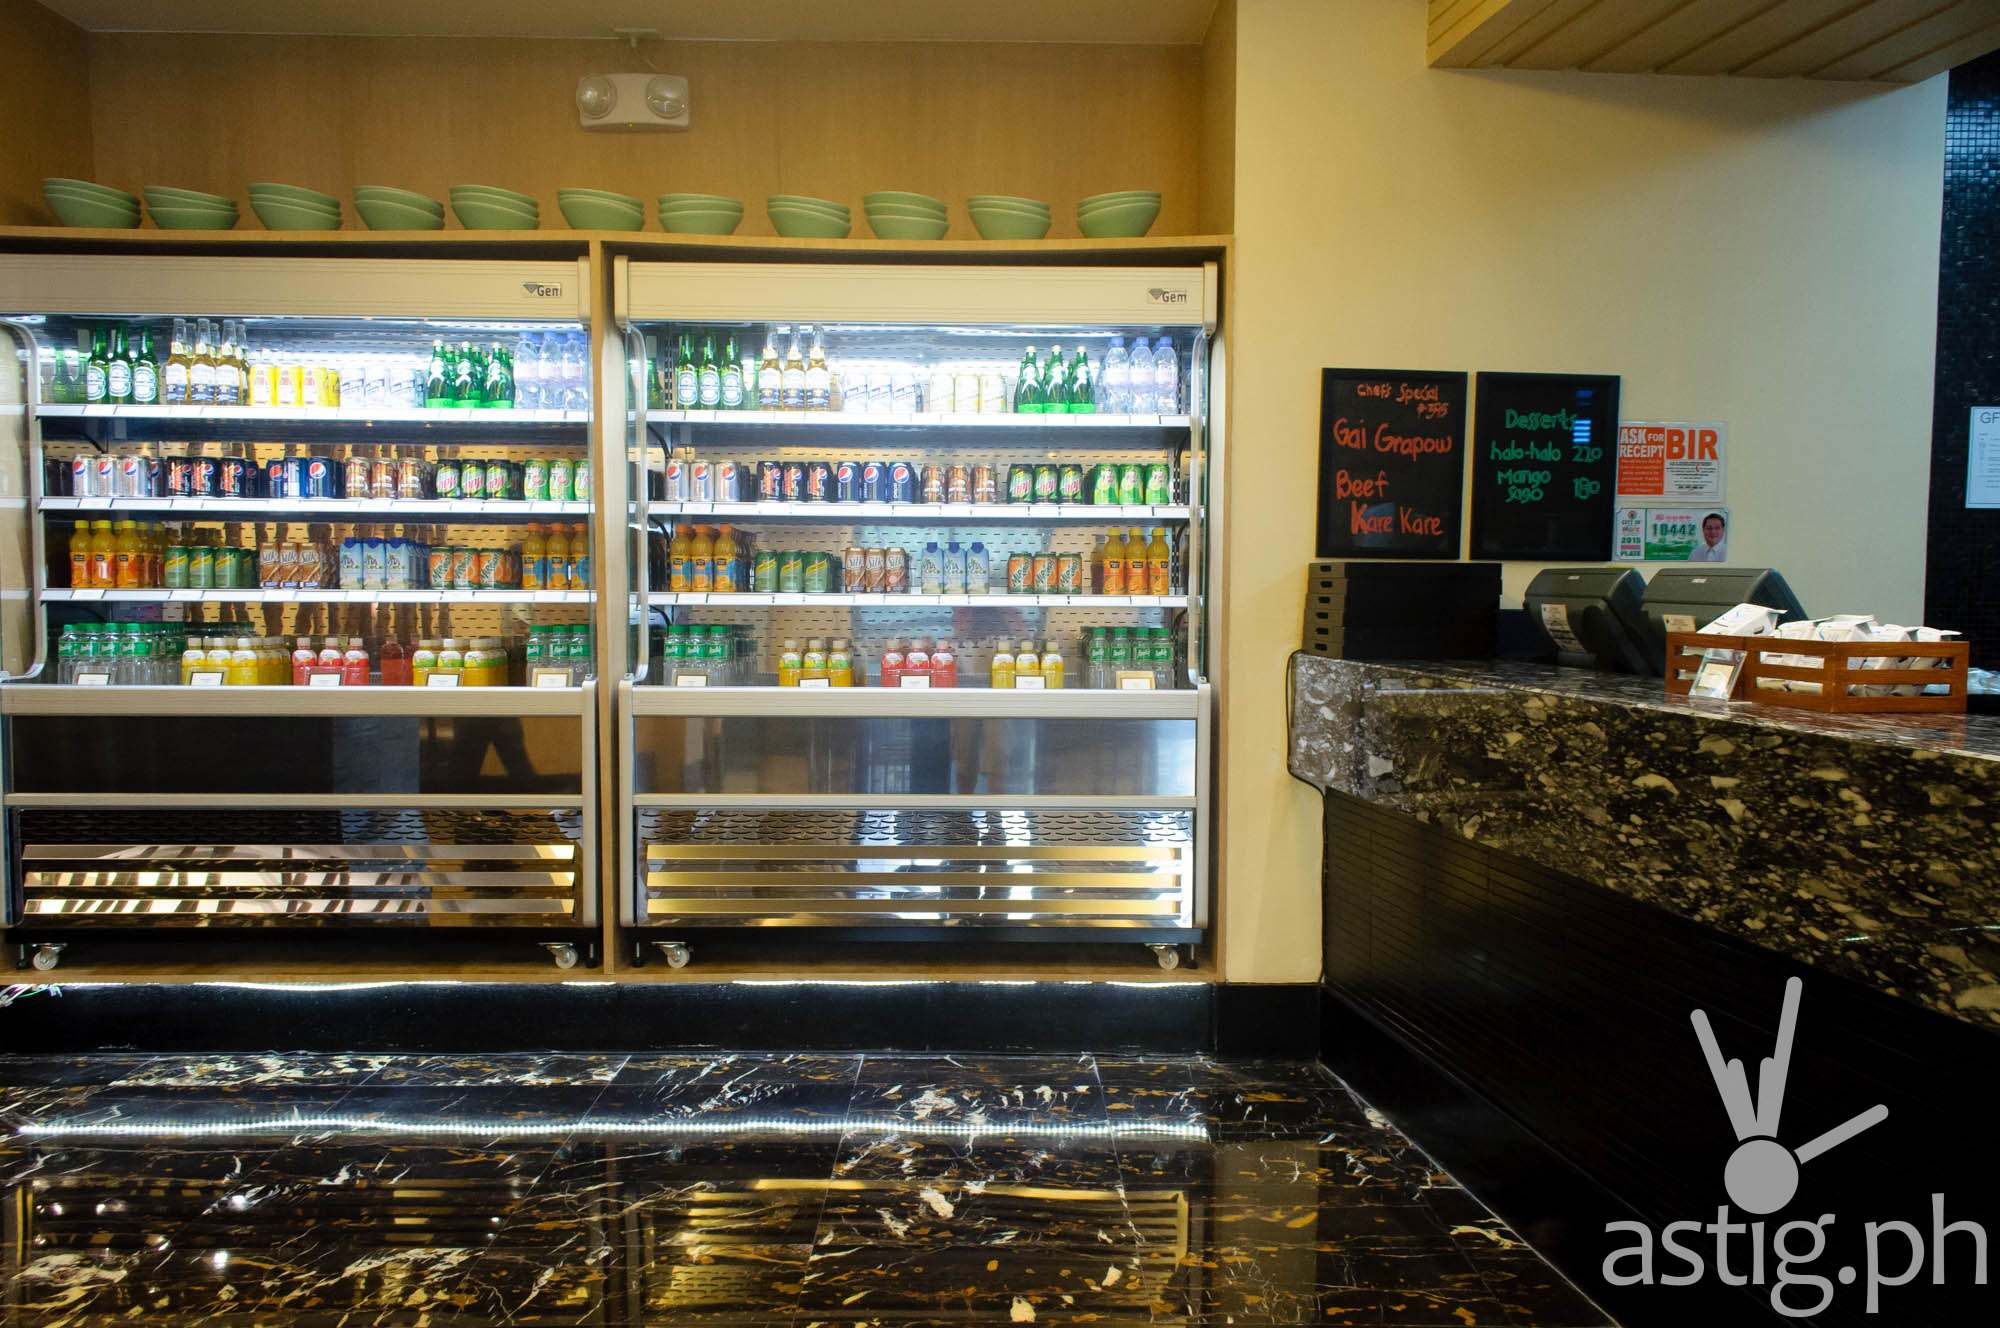 Chilled drinks freezer - Mian at Marriott Grand Ballroom